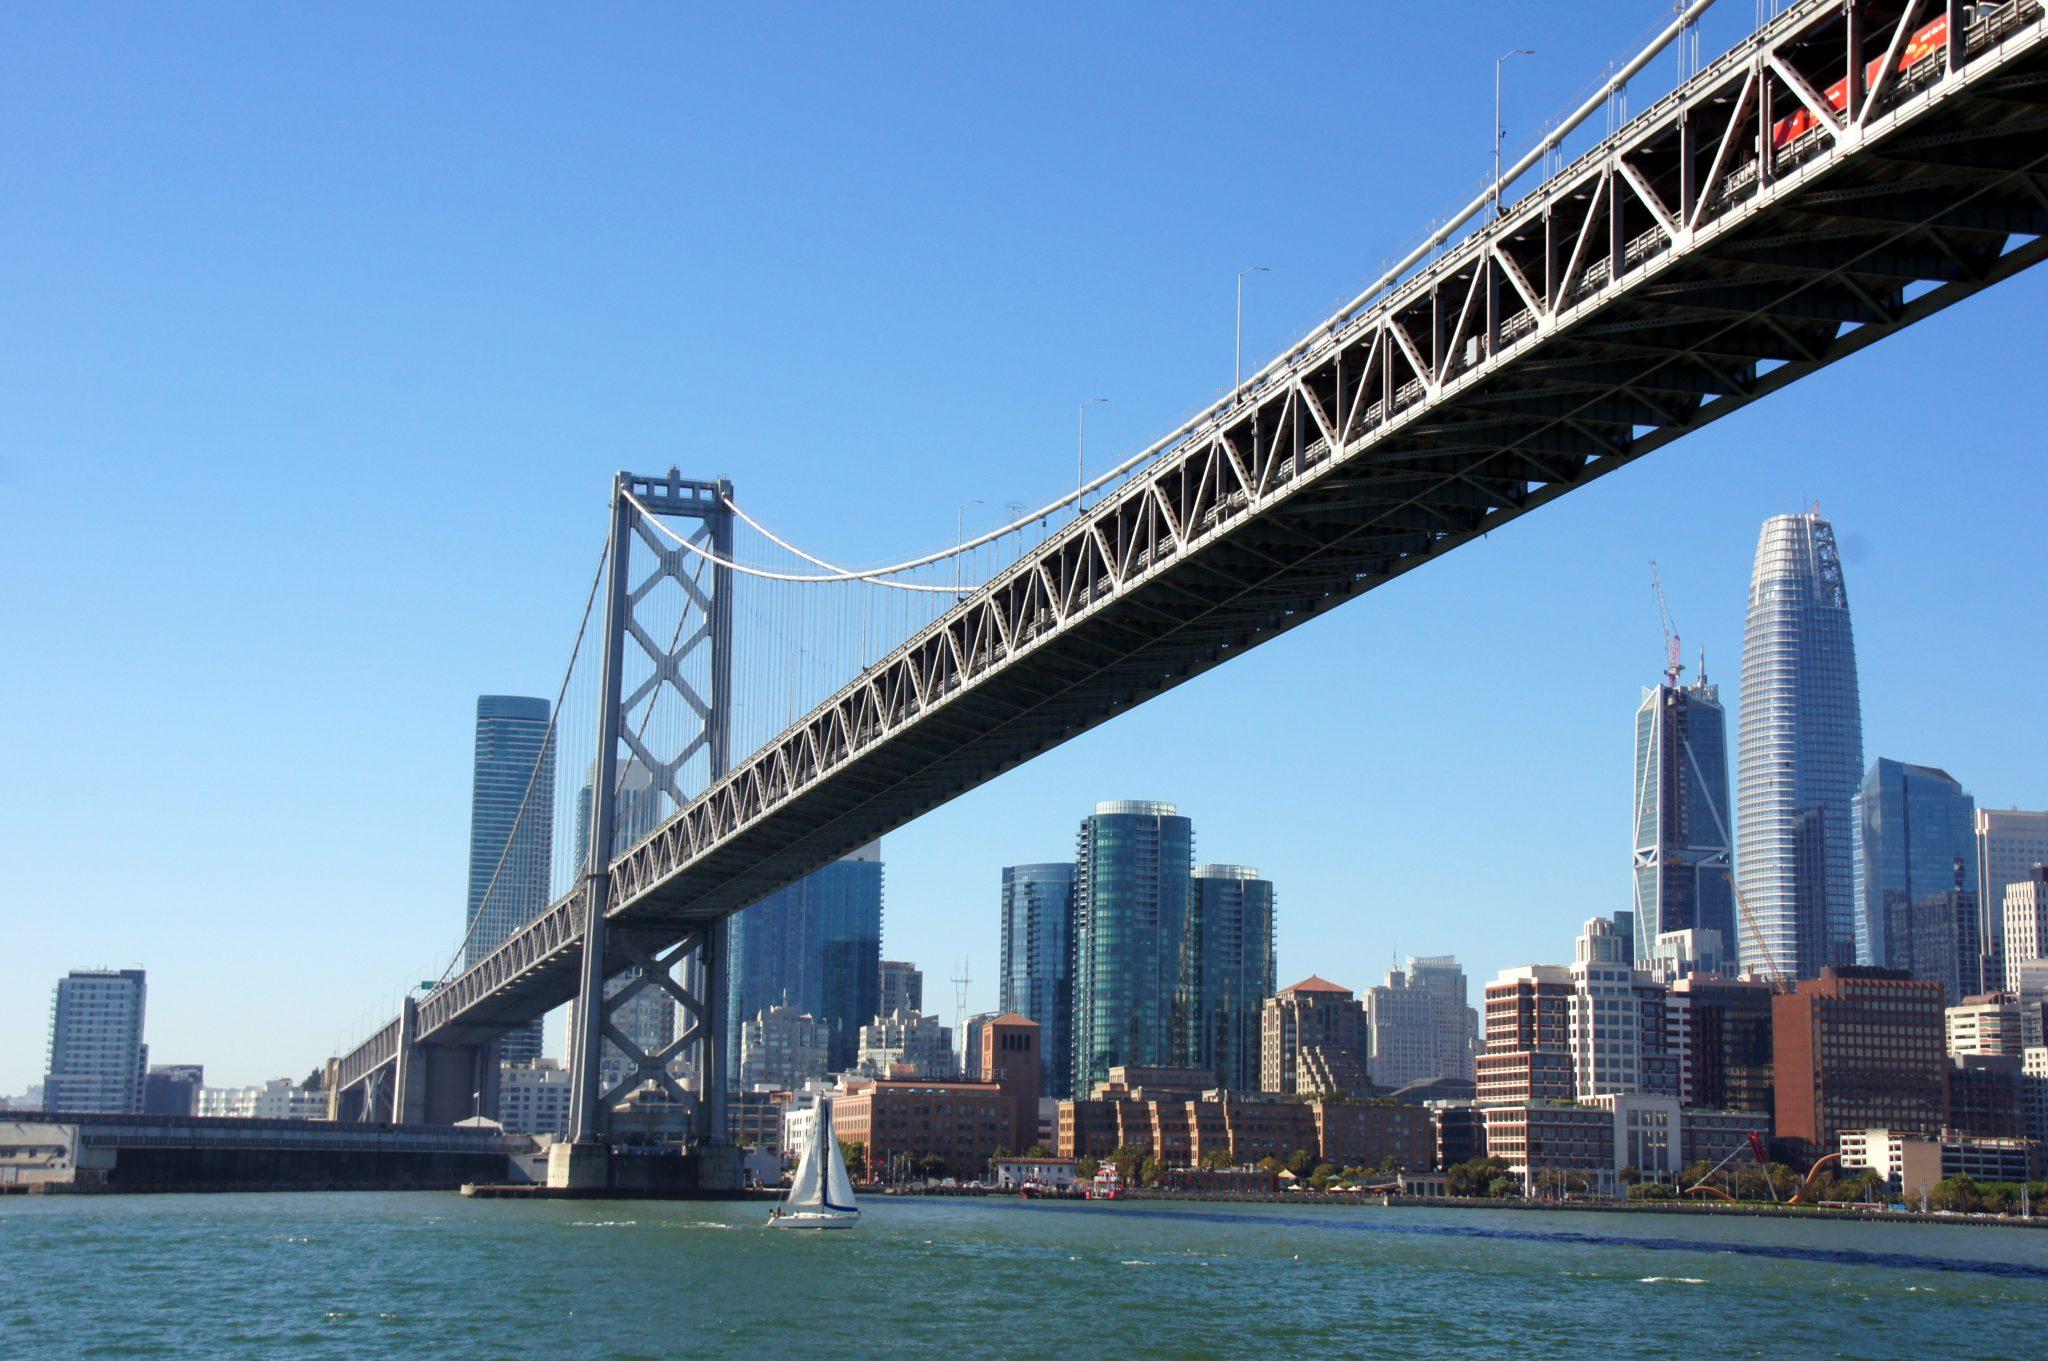 Baybridge with skyline of San Francisco